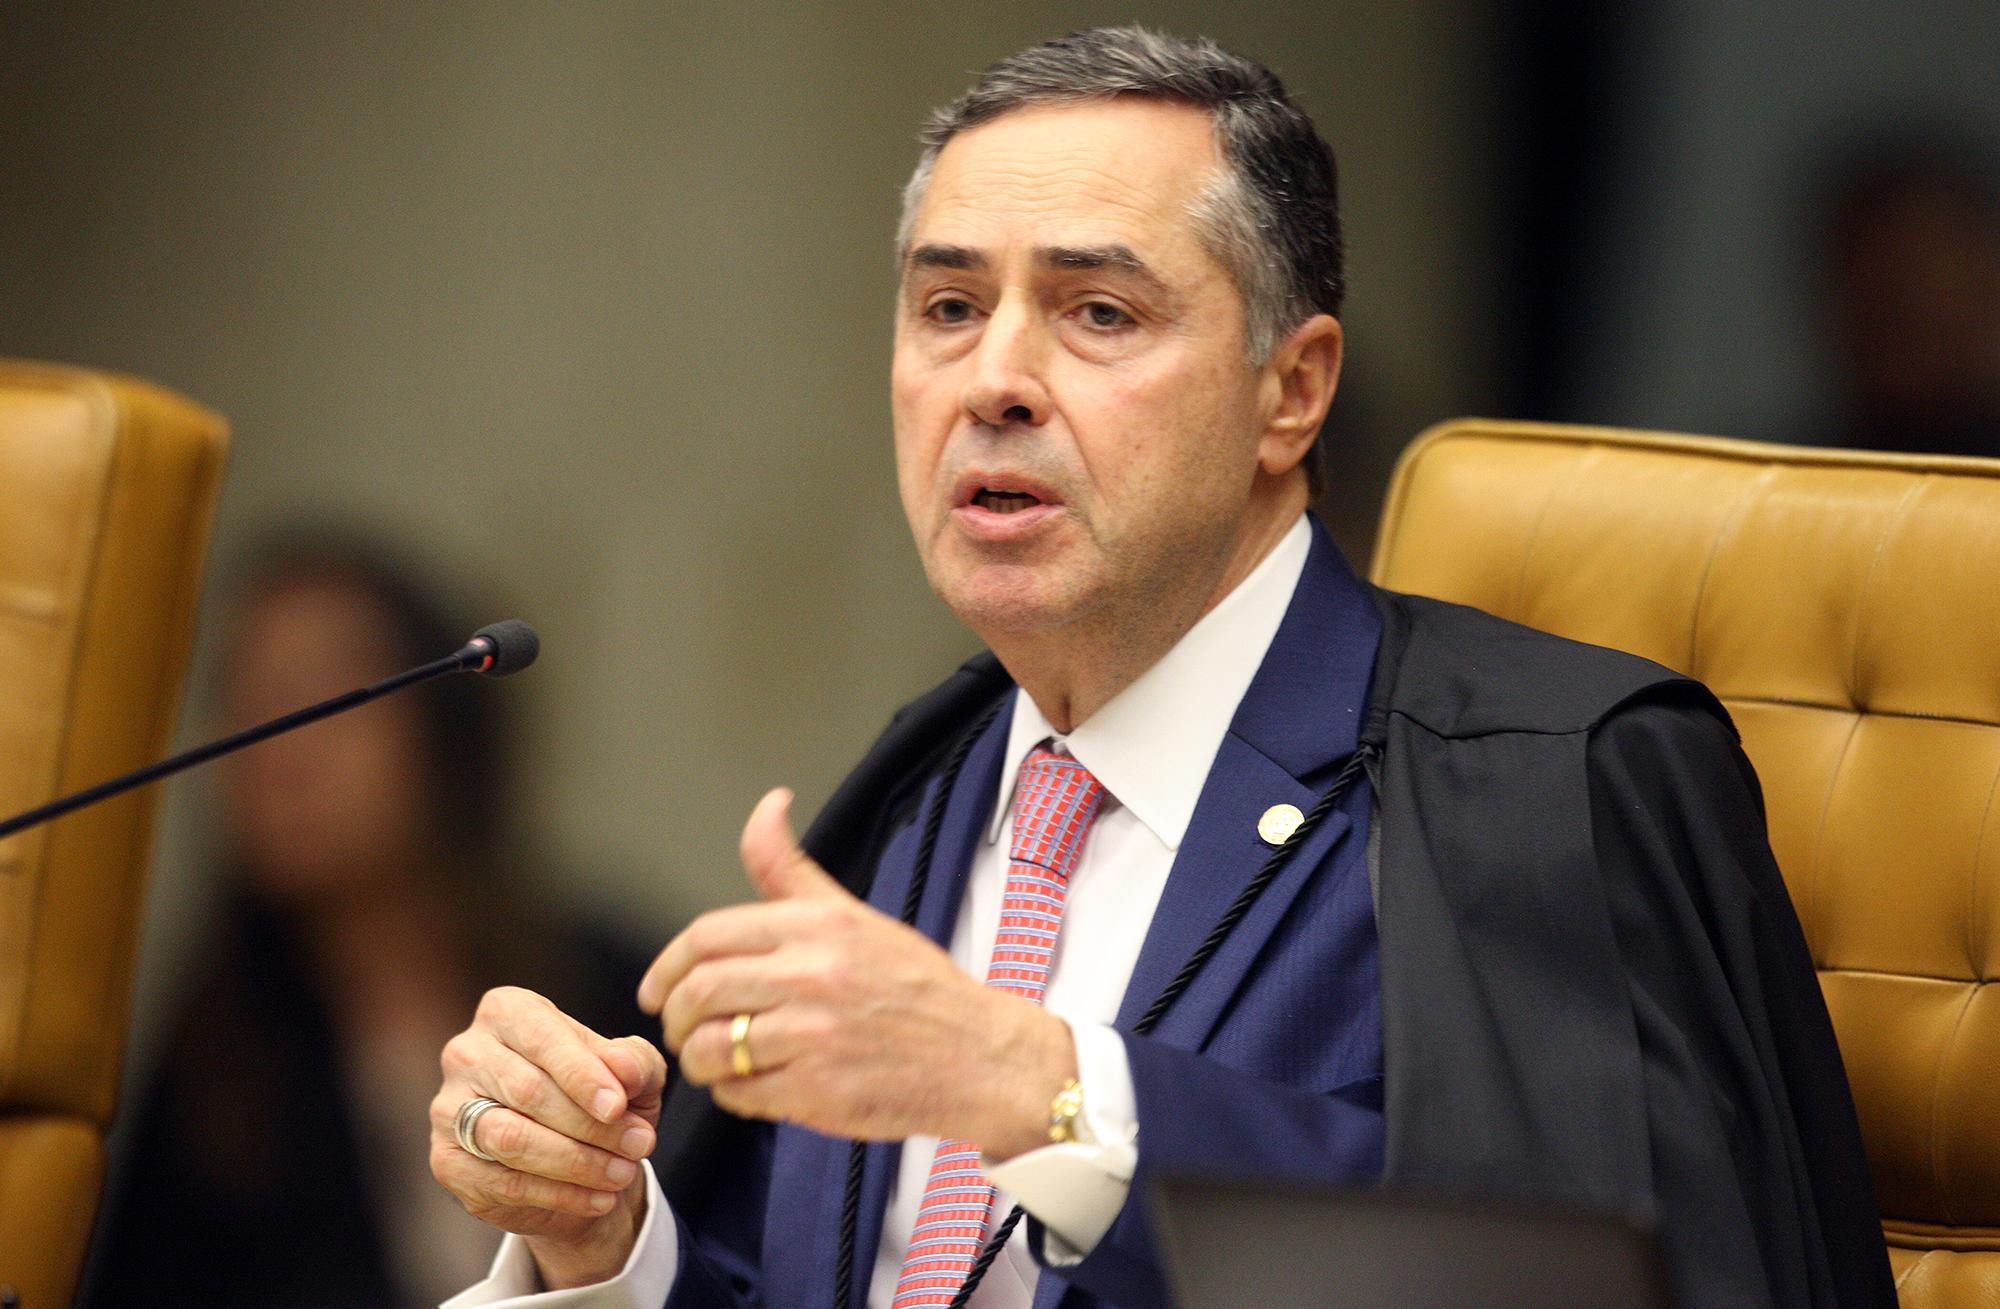 Ministro Luís Roberto Barroso foi relator do caso no STF